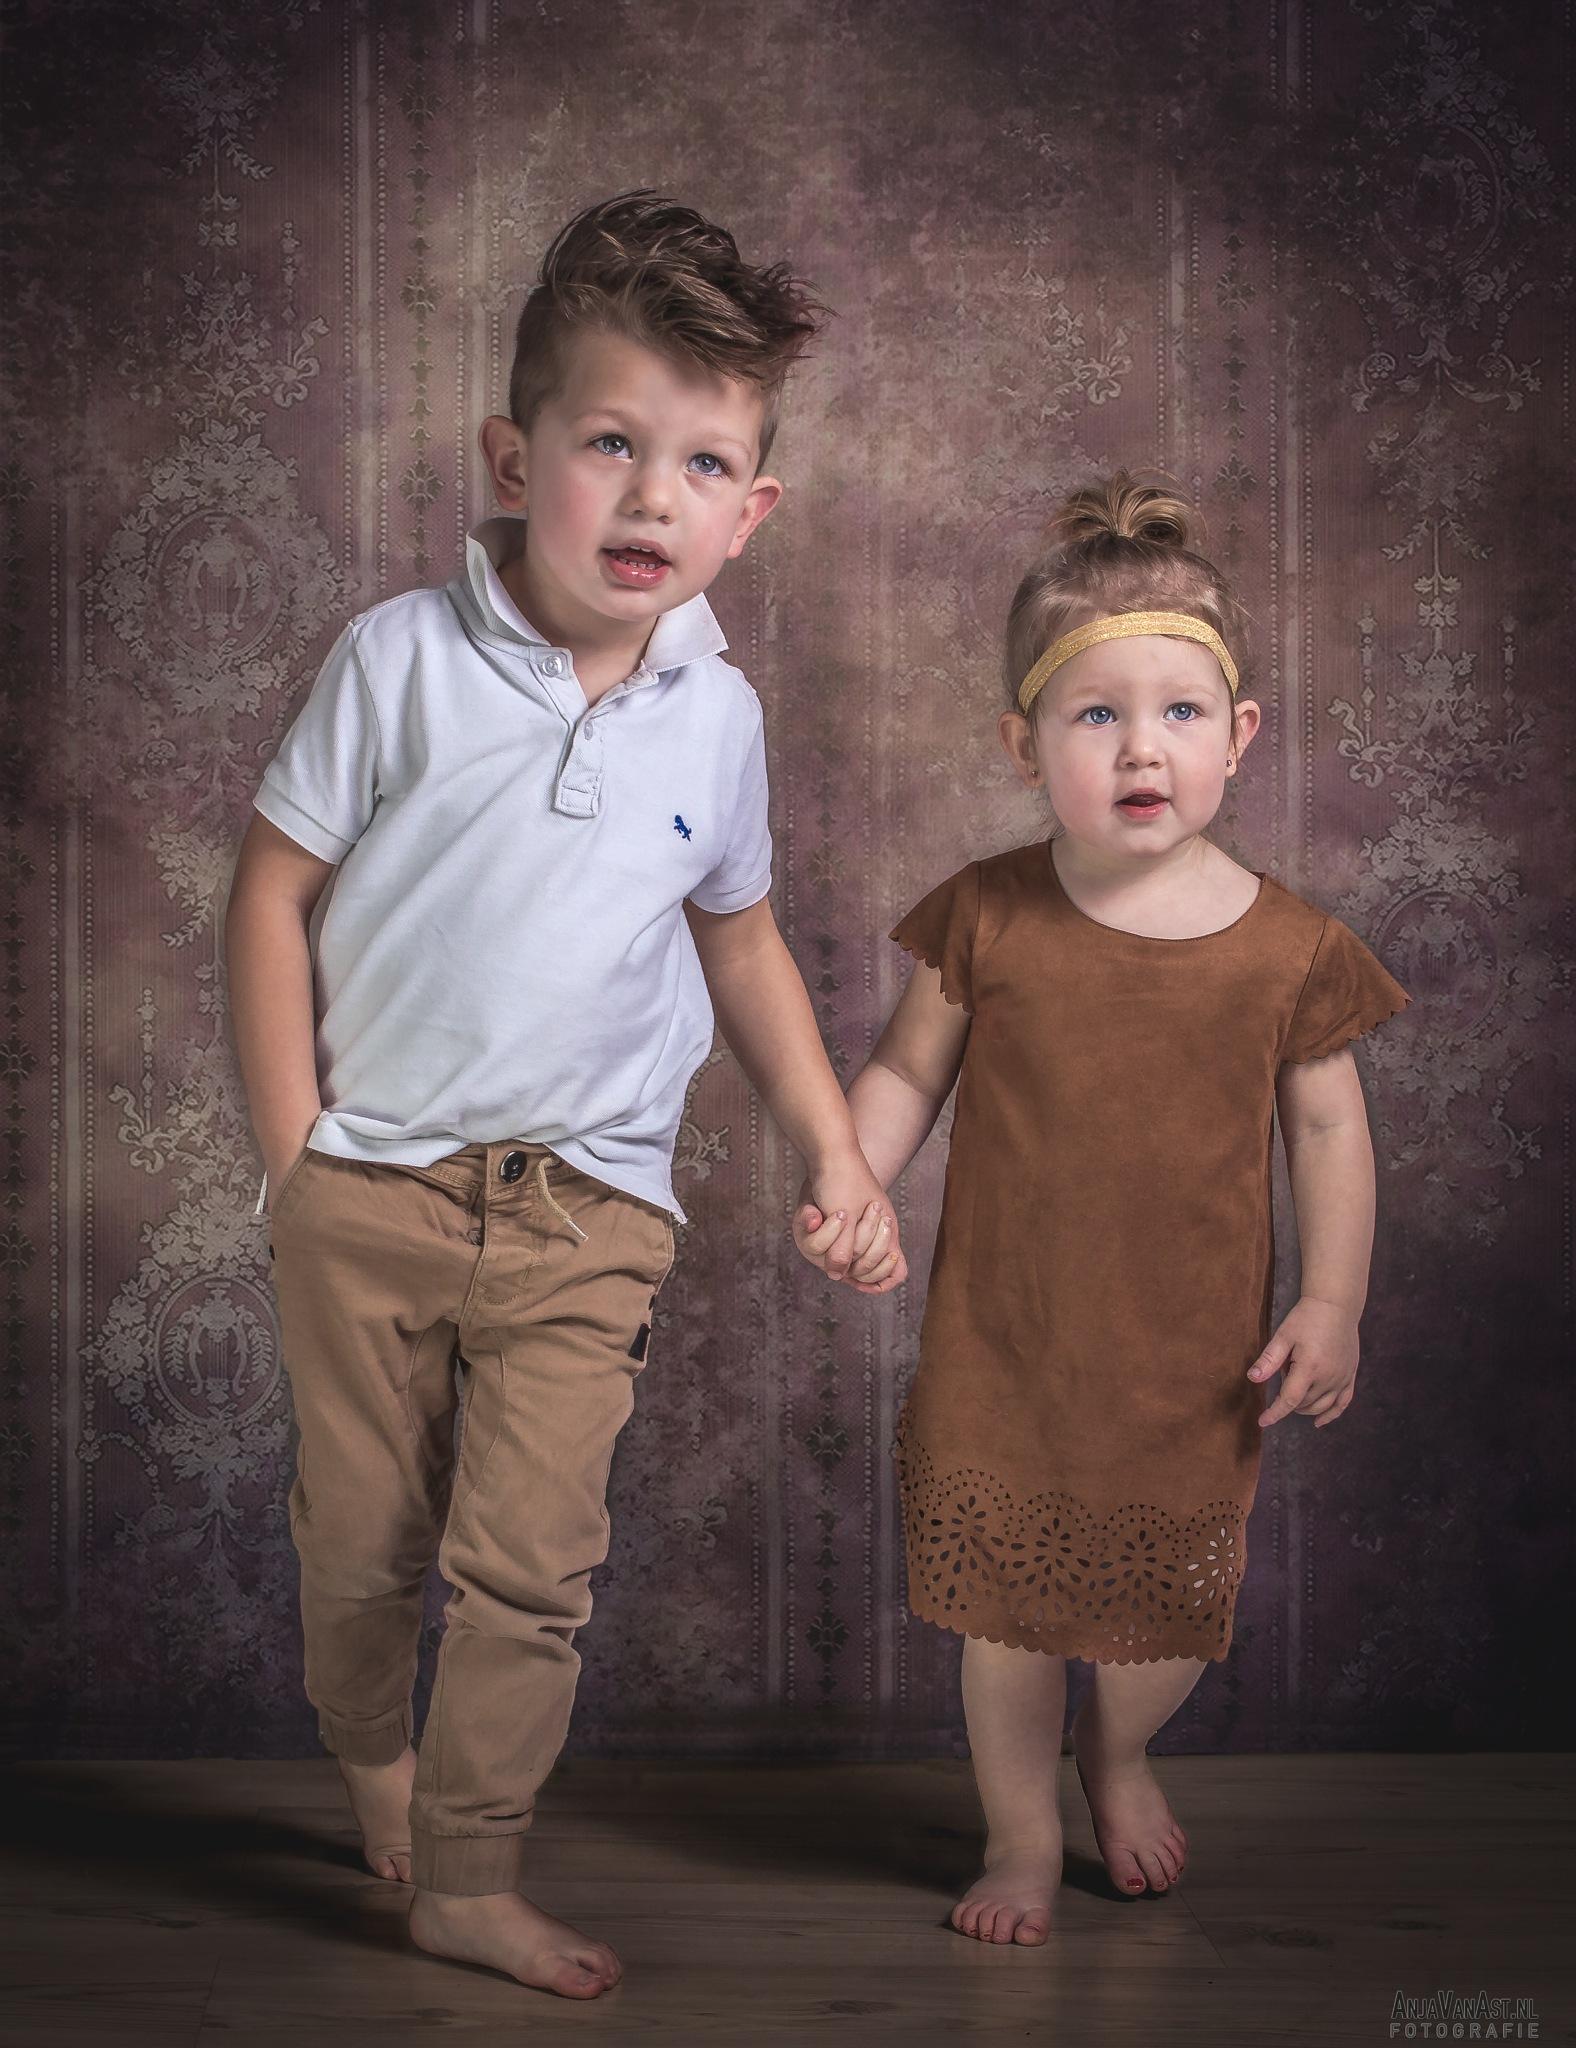 Luc & Liz by avast